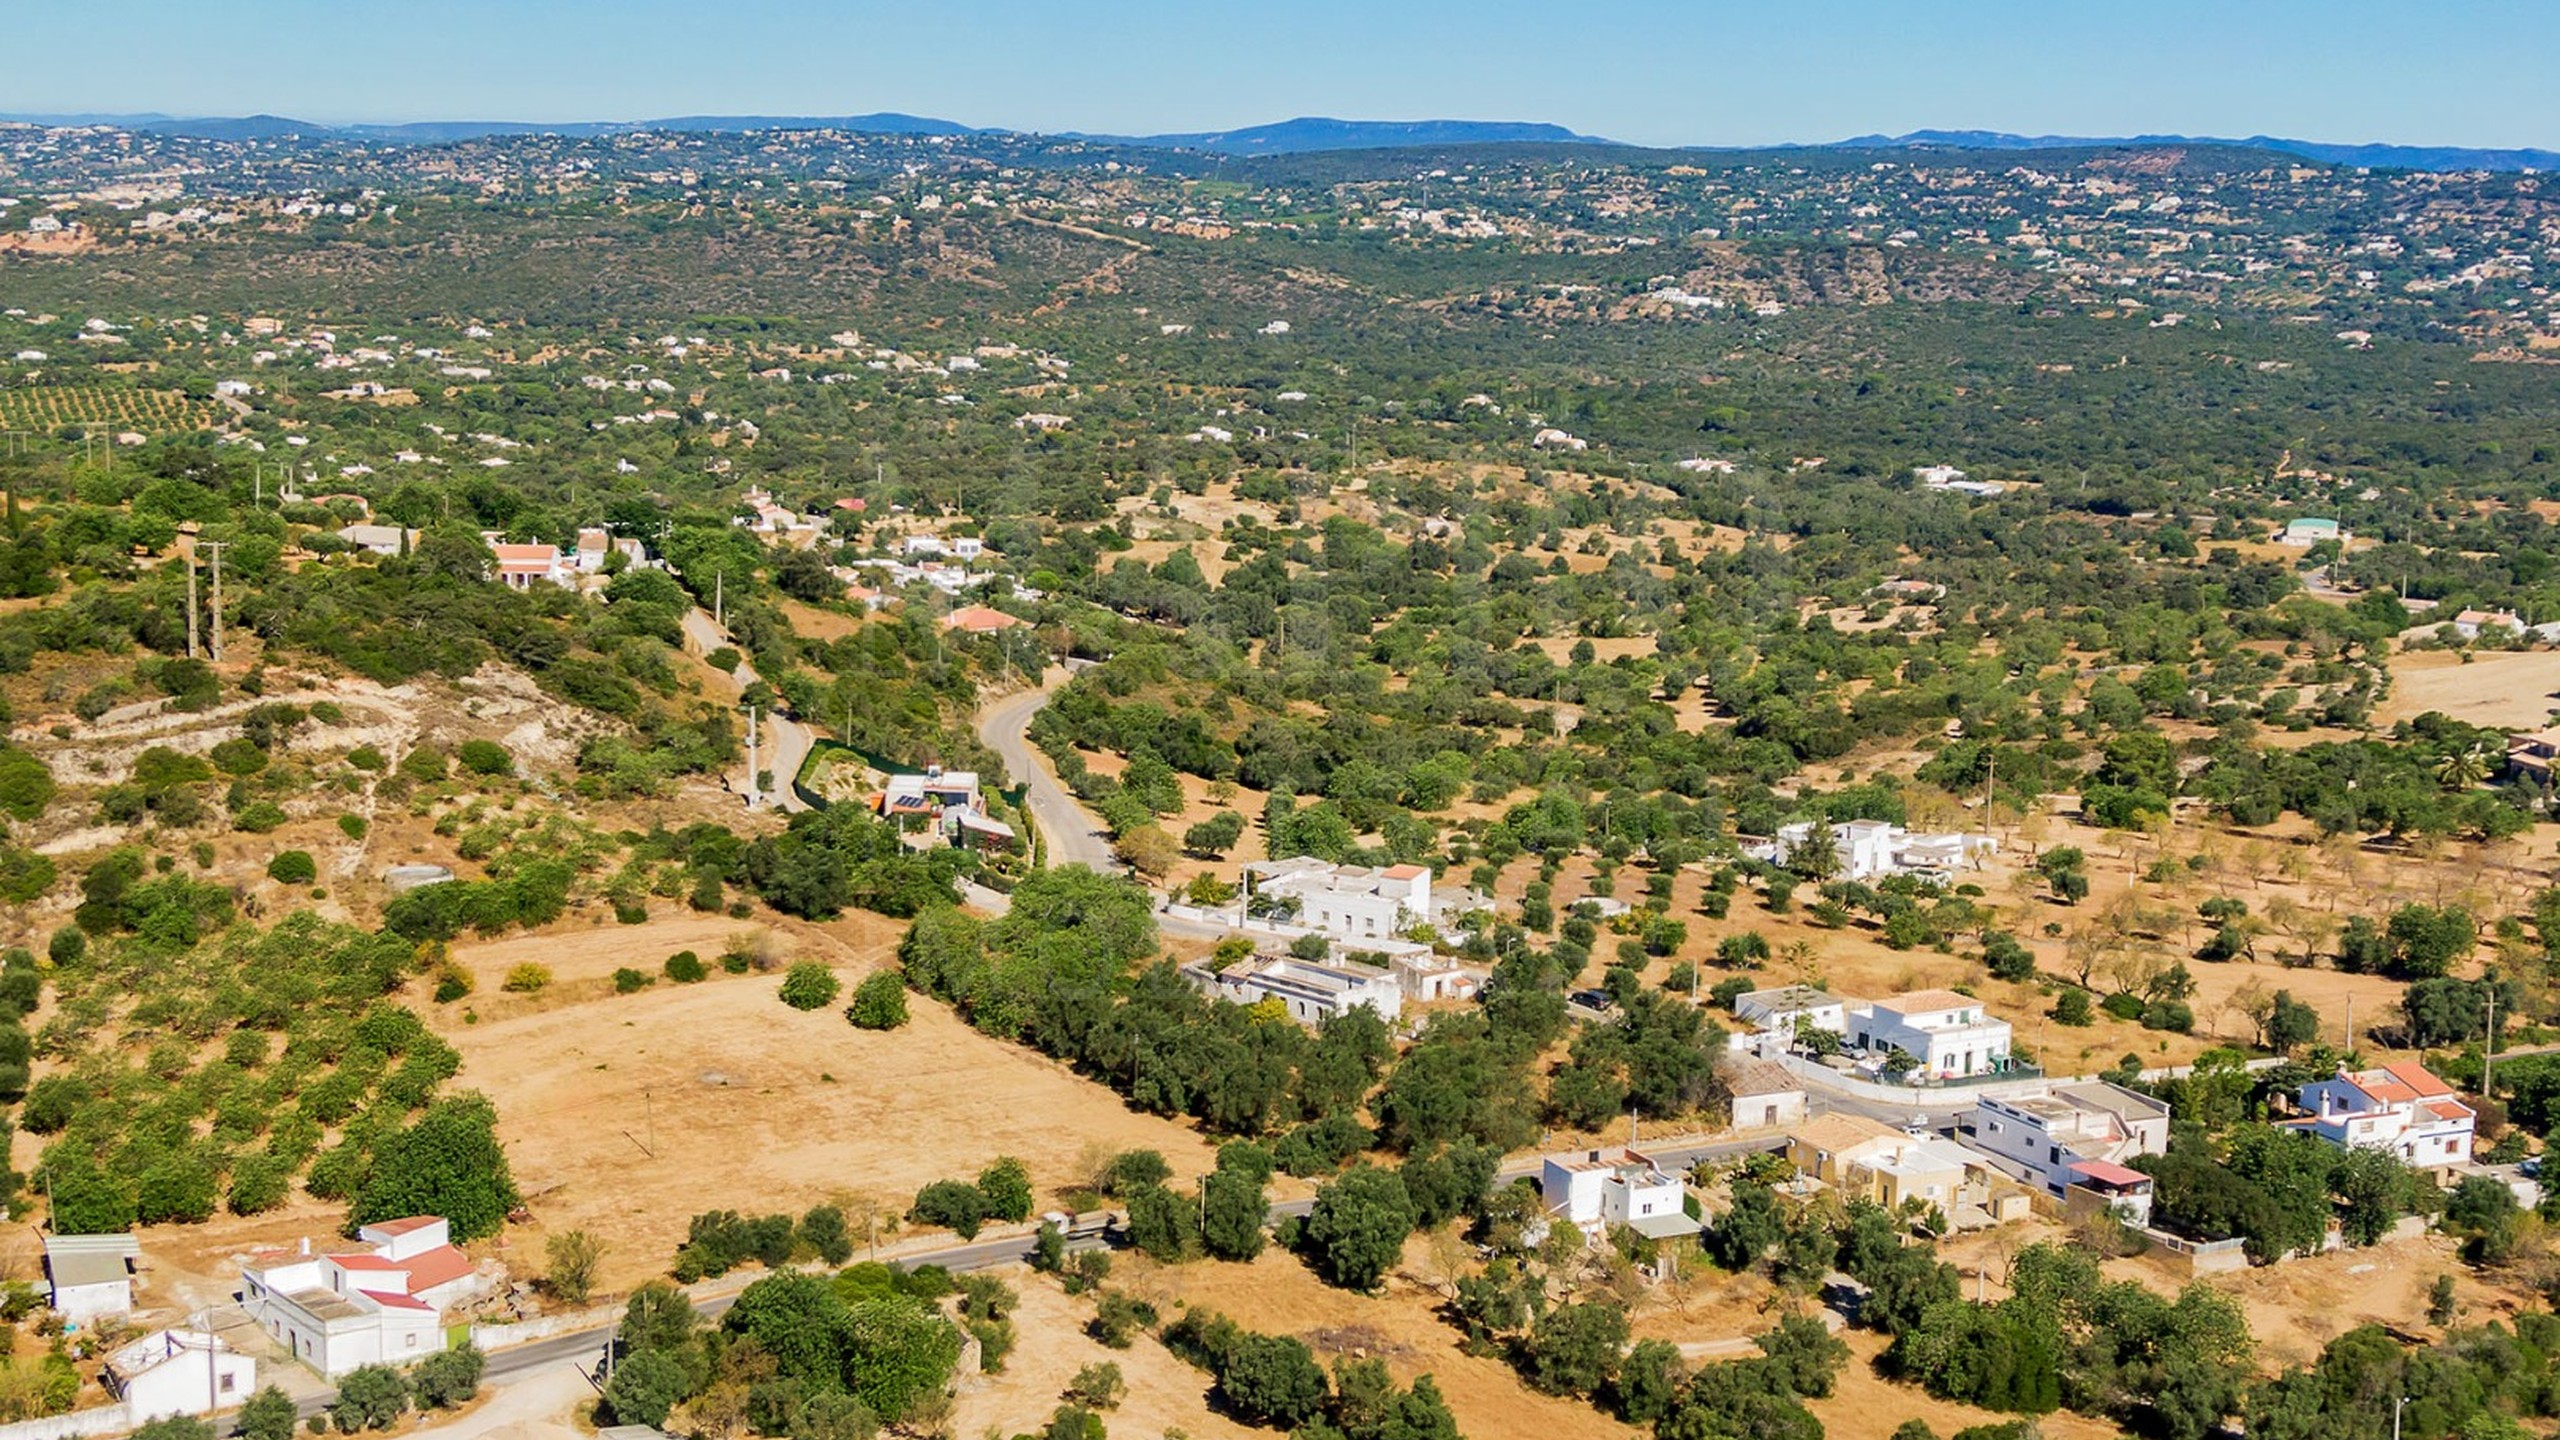 Terreno em Santa Bárbara de Nexe, Algarve